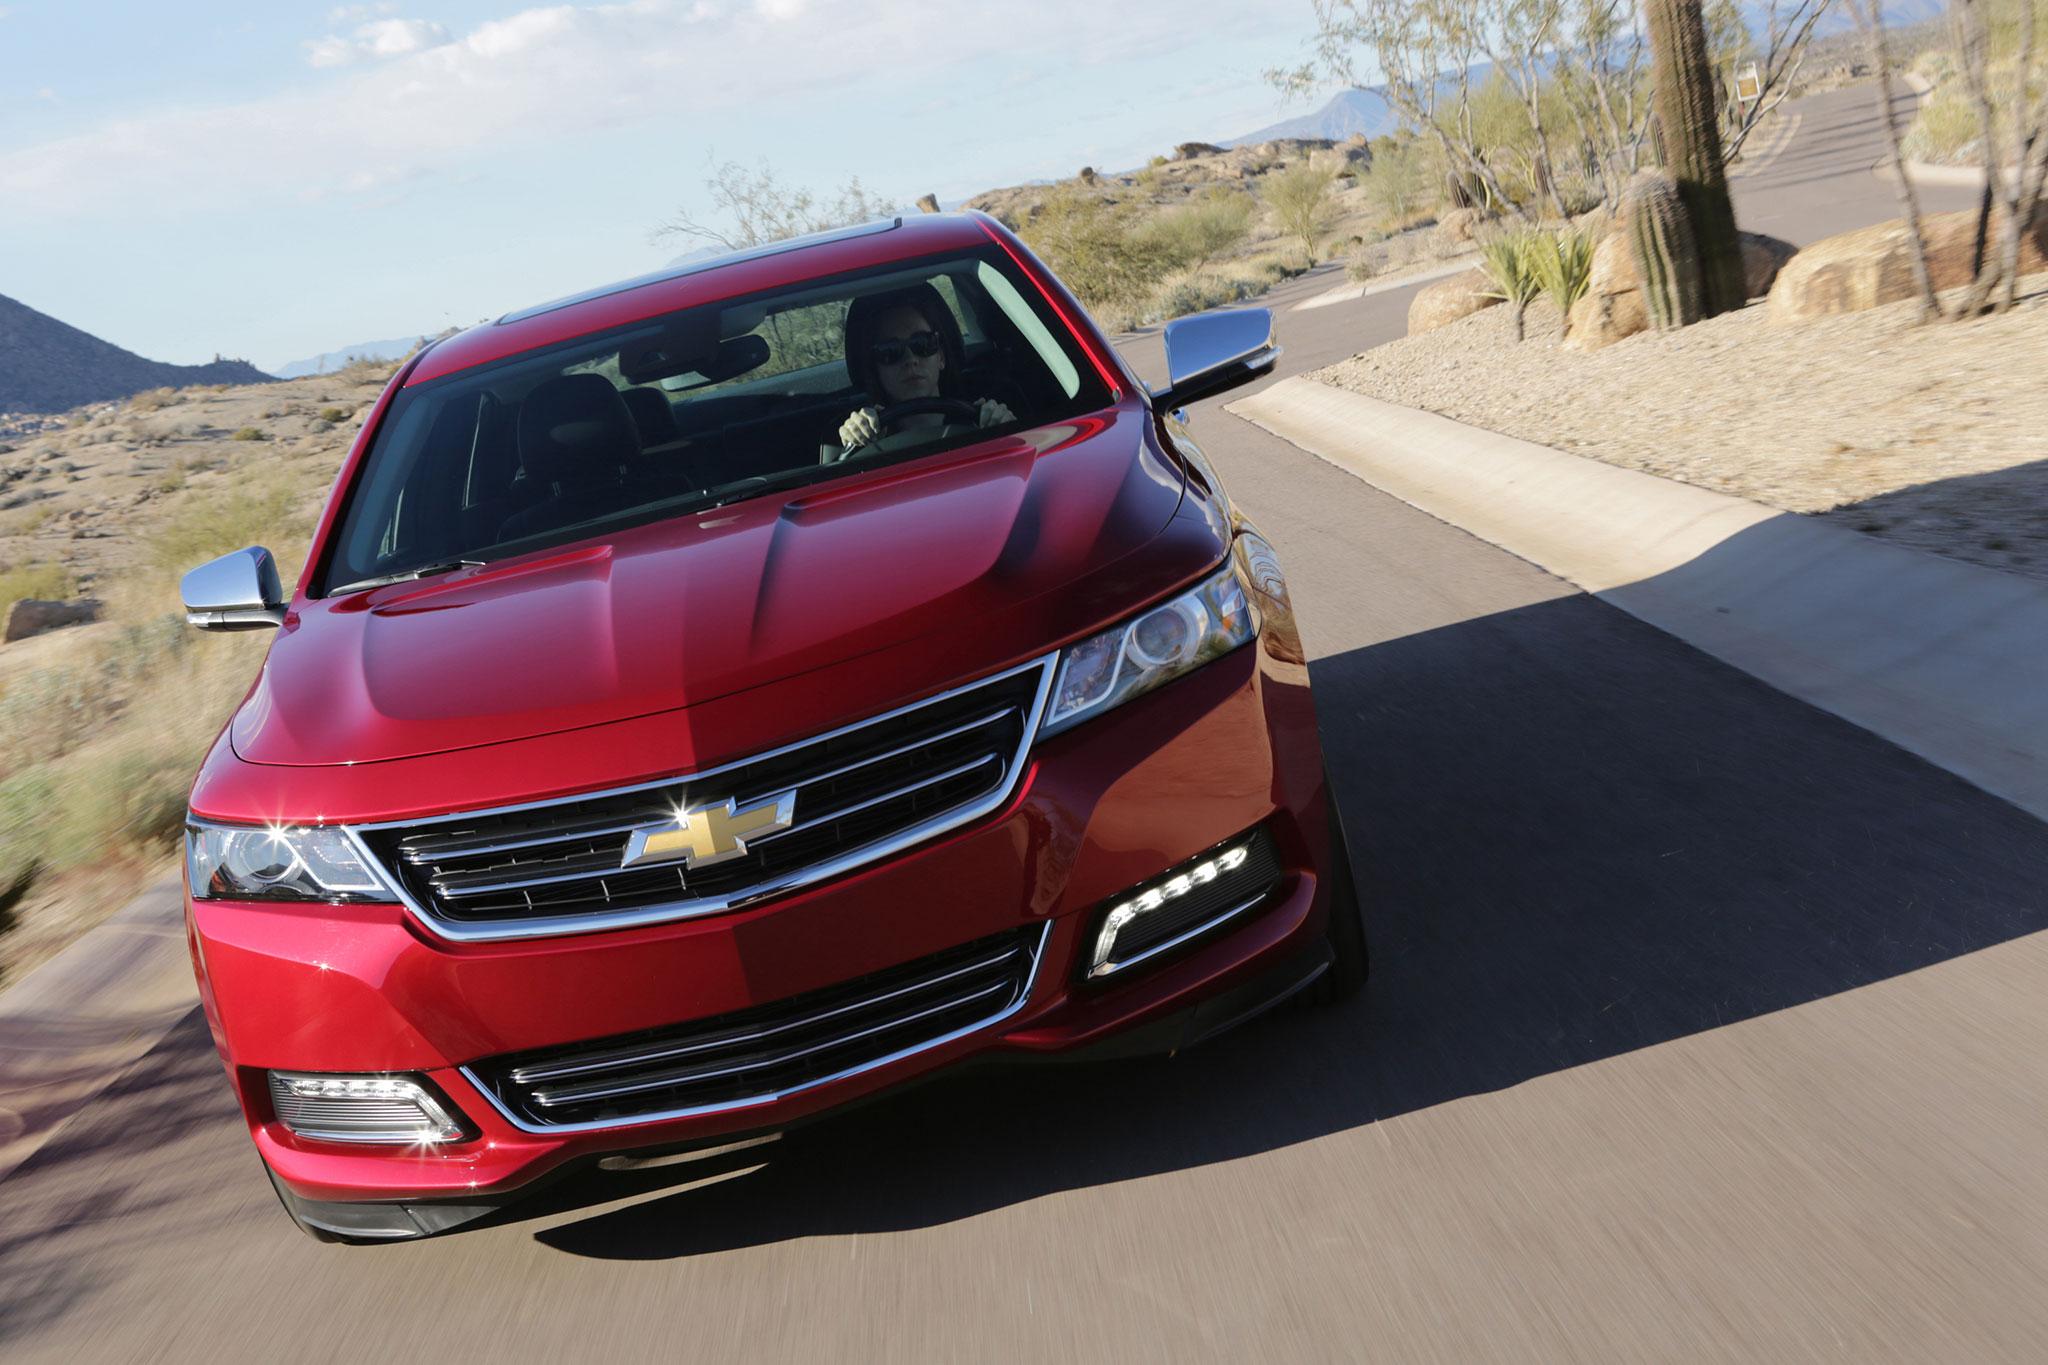 2014 Chevrolet Impala LTZ Front View In Motion1